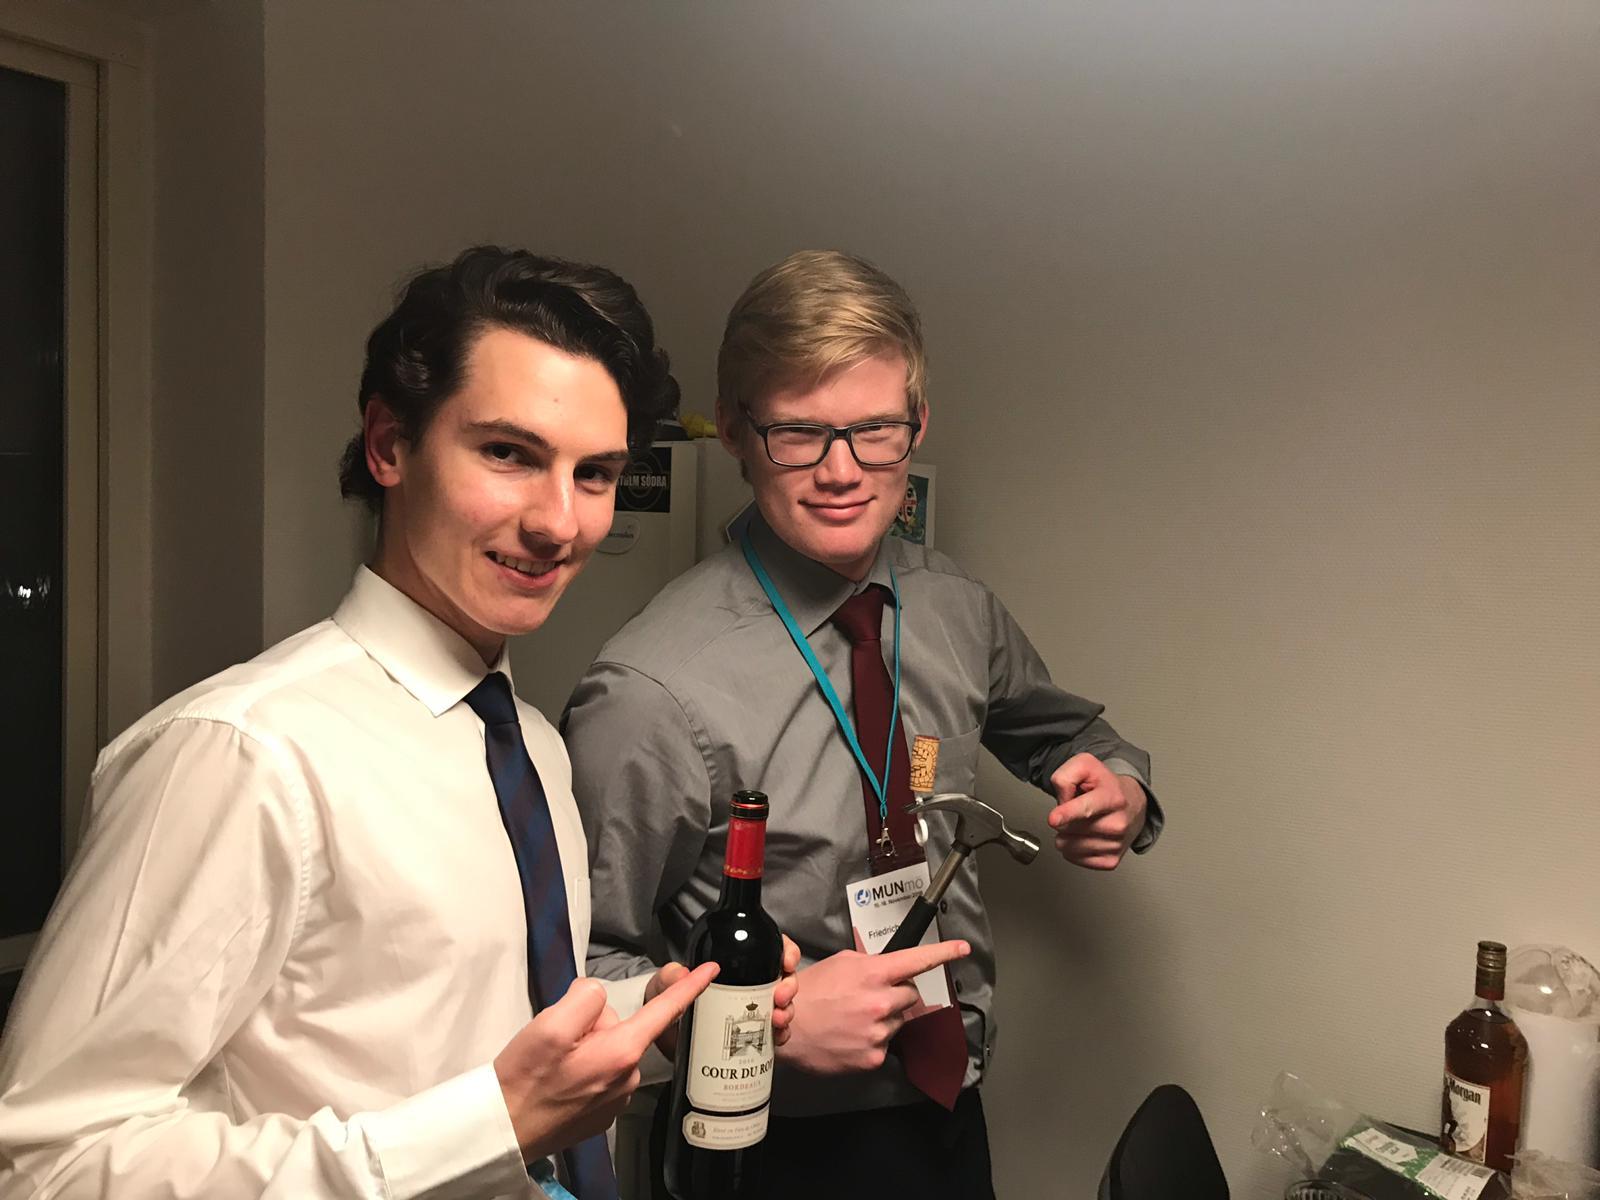 Wine drinking level: German.